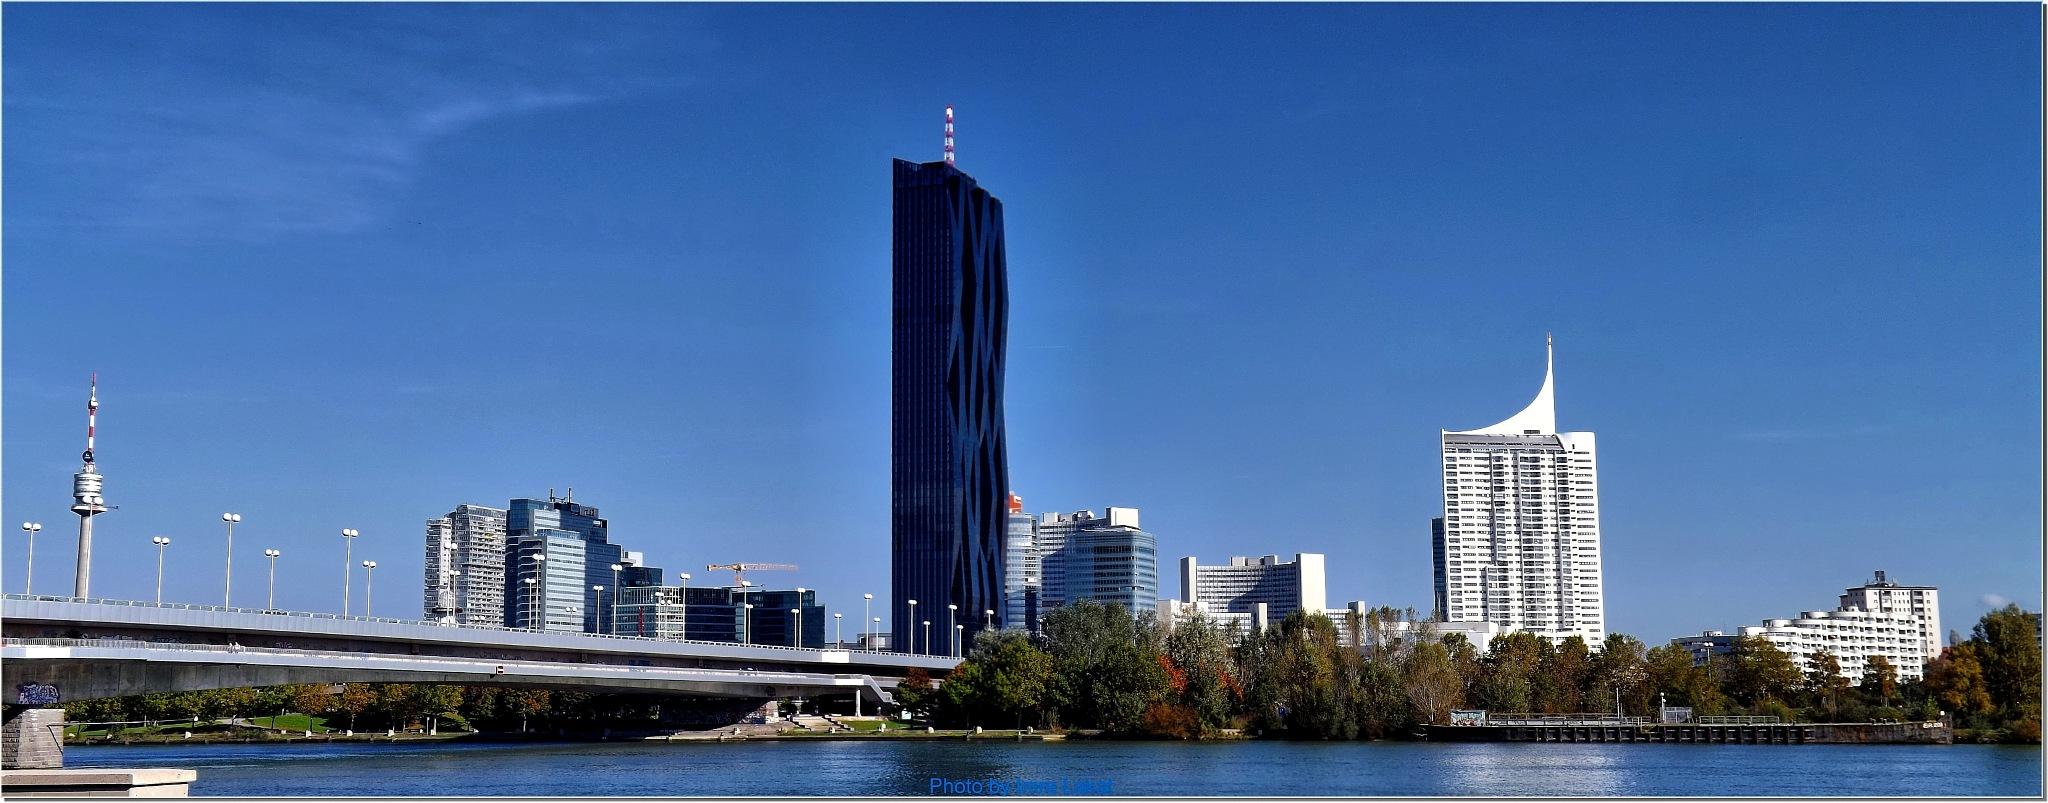 . DC Tower ... Handelskai 265, 1020 Wien, Ausztria by Imre Lakat